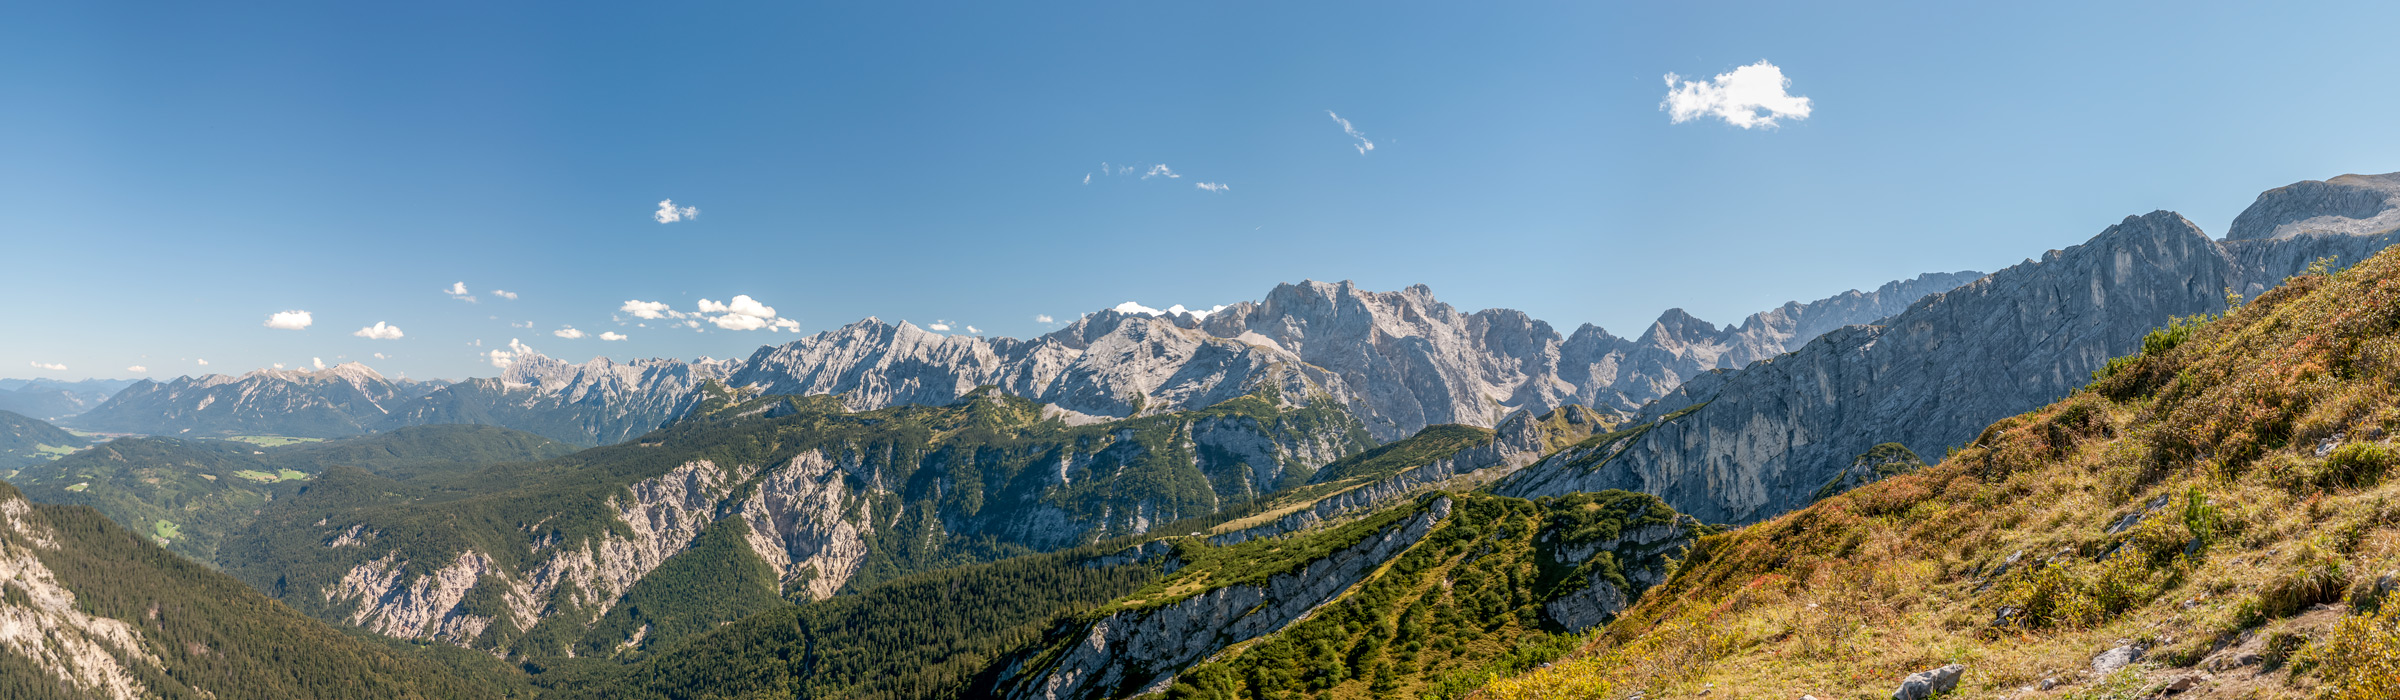 atemberaubendes Gipfelpanorama in Garmisch